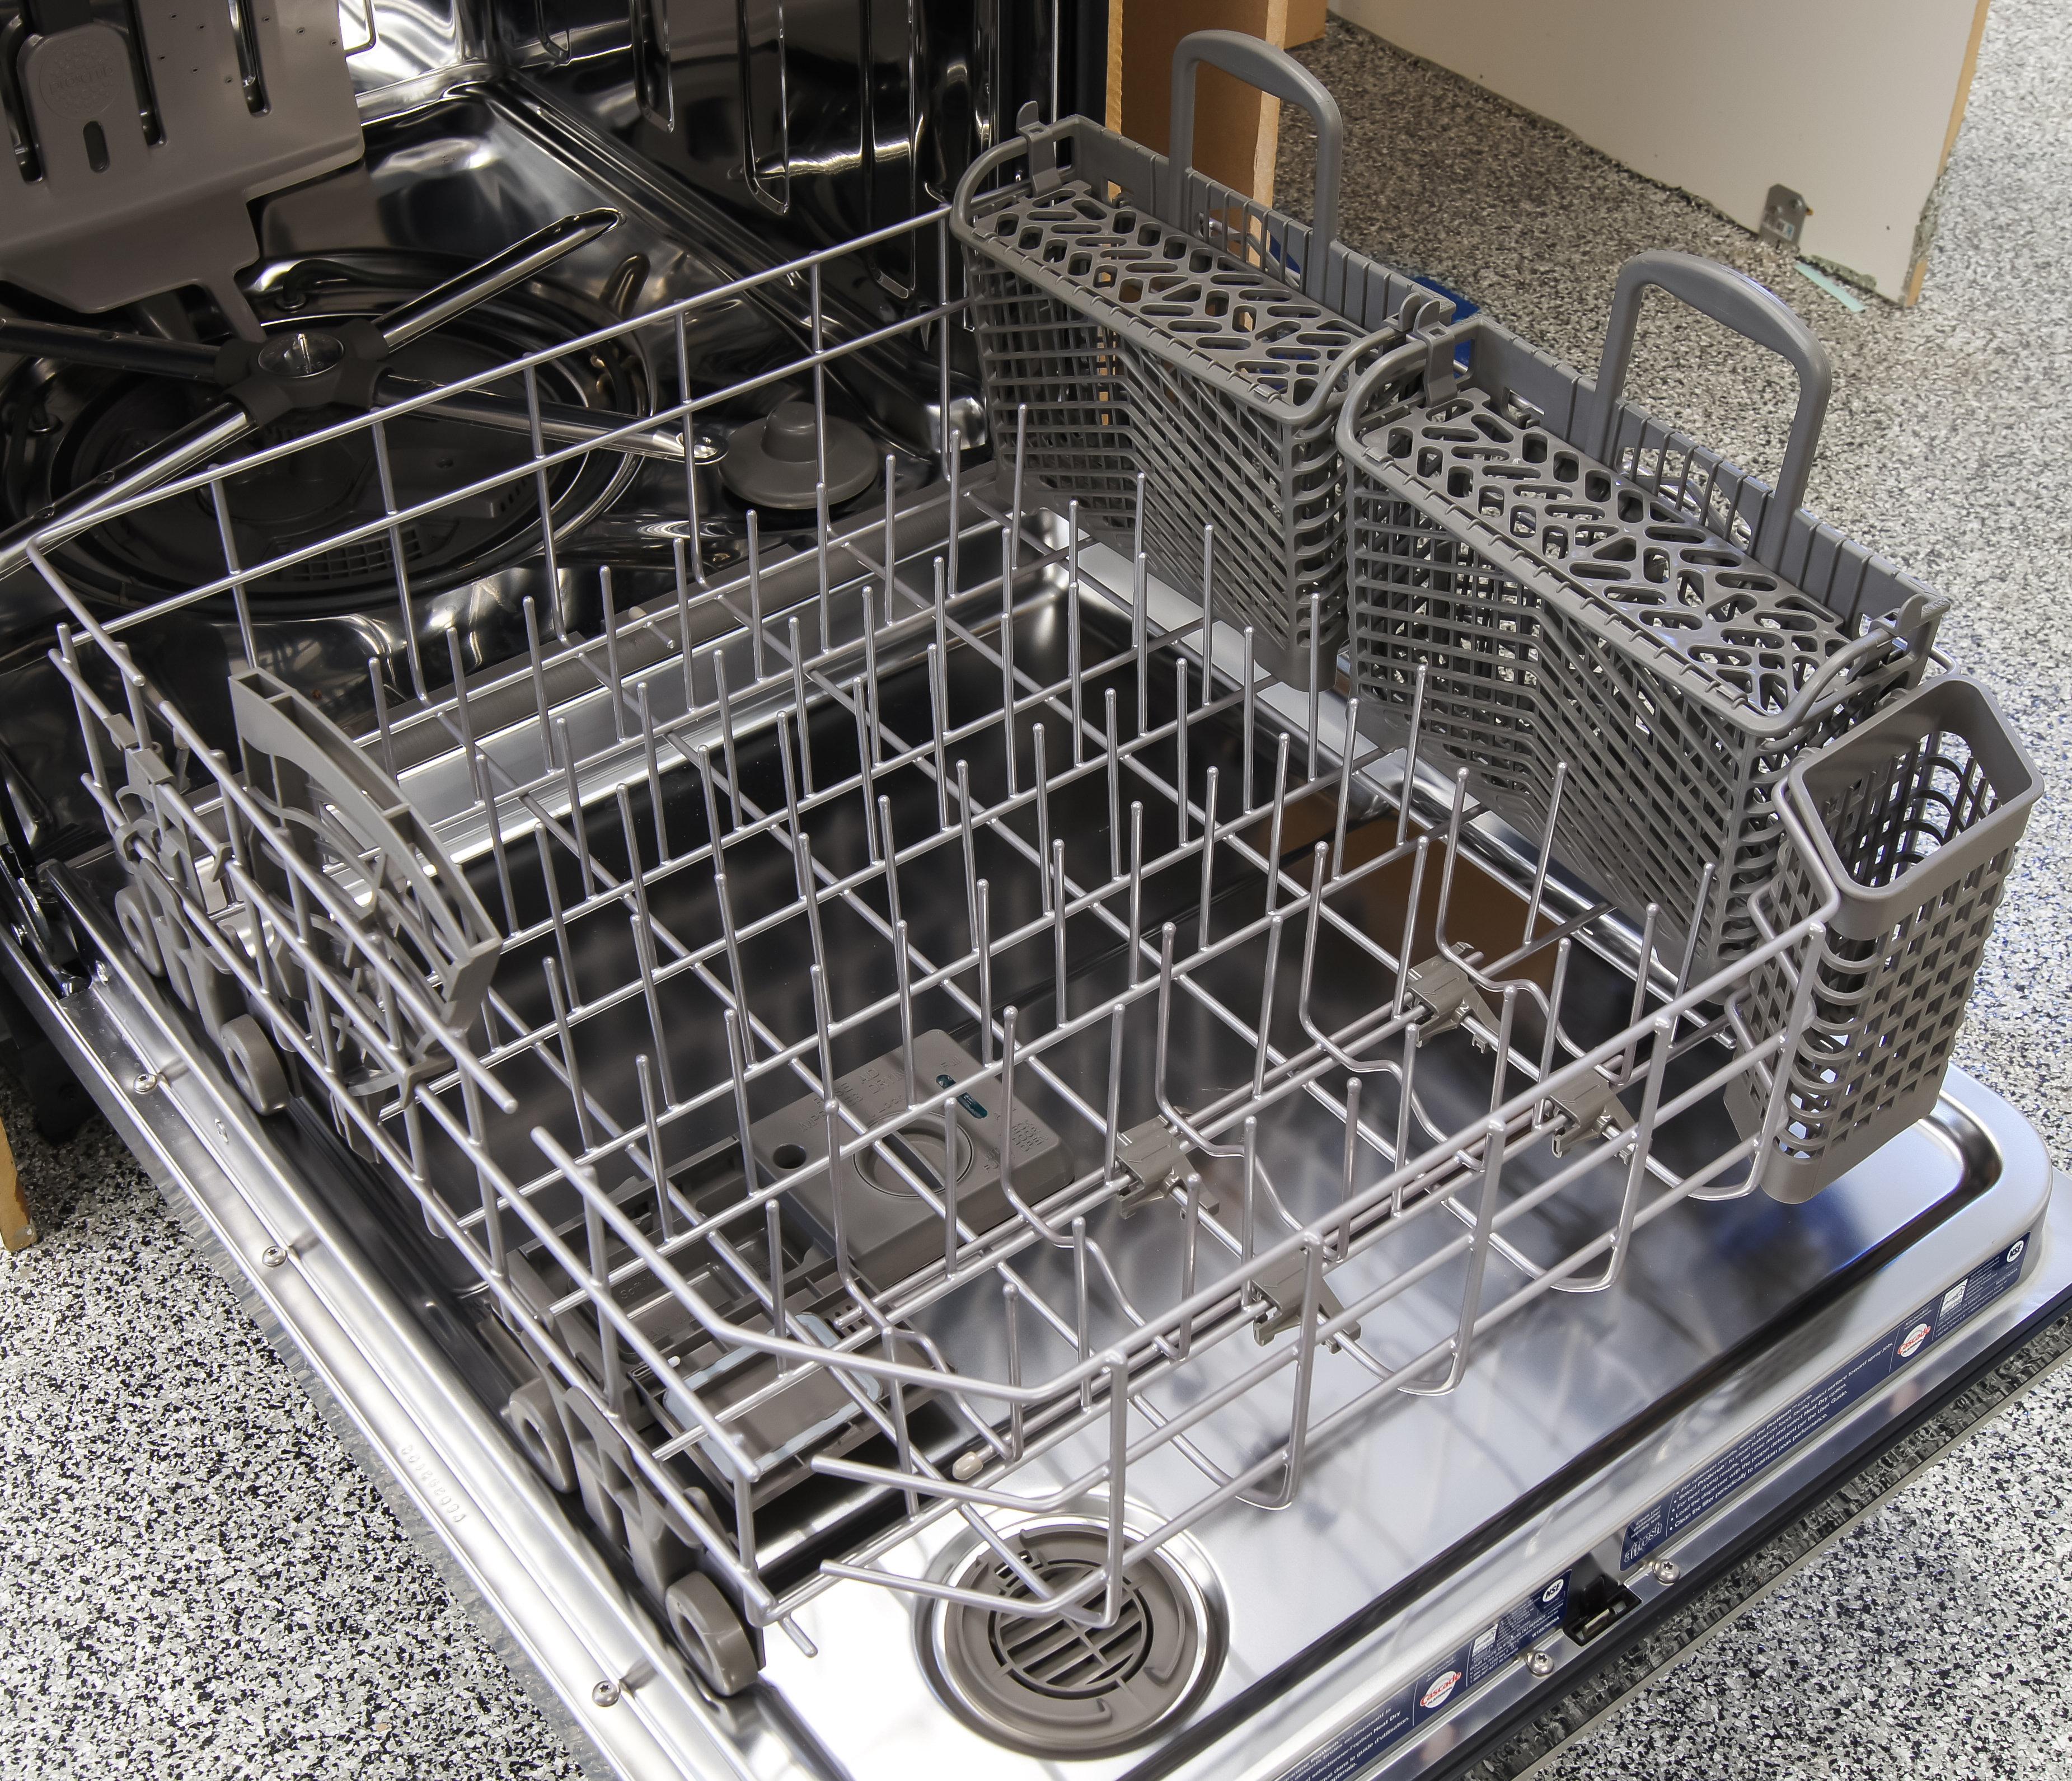 KitchenAid Architect Series II KDTM354DSS Dishwasher Review